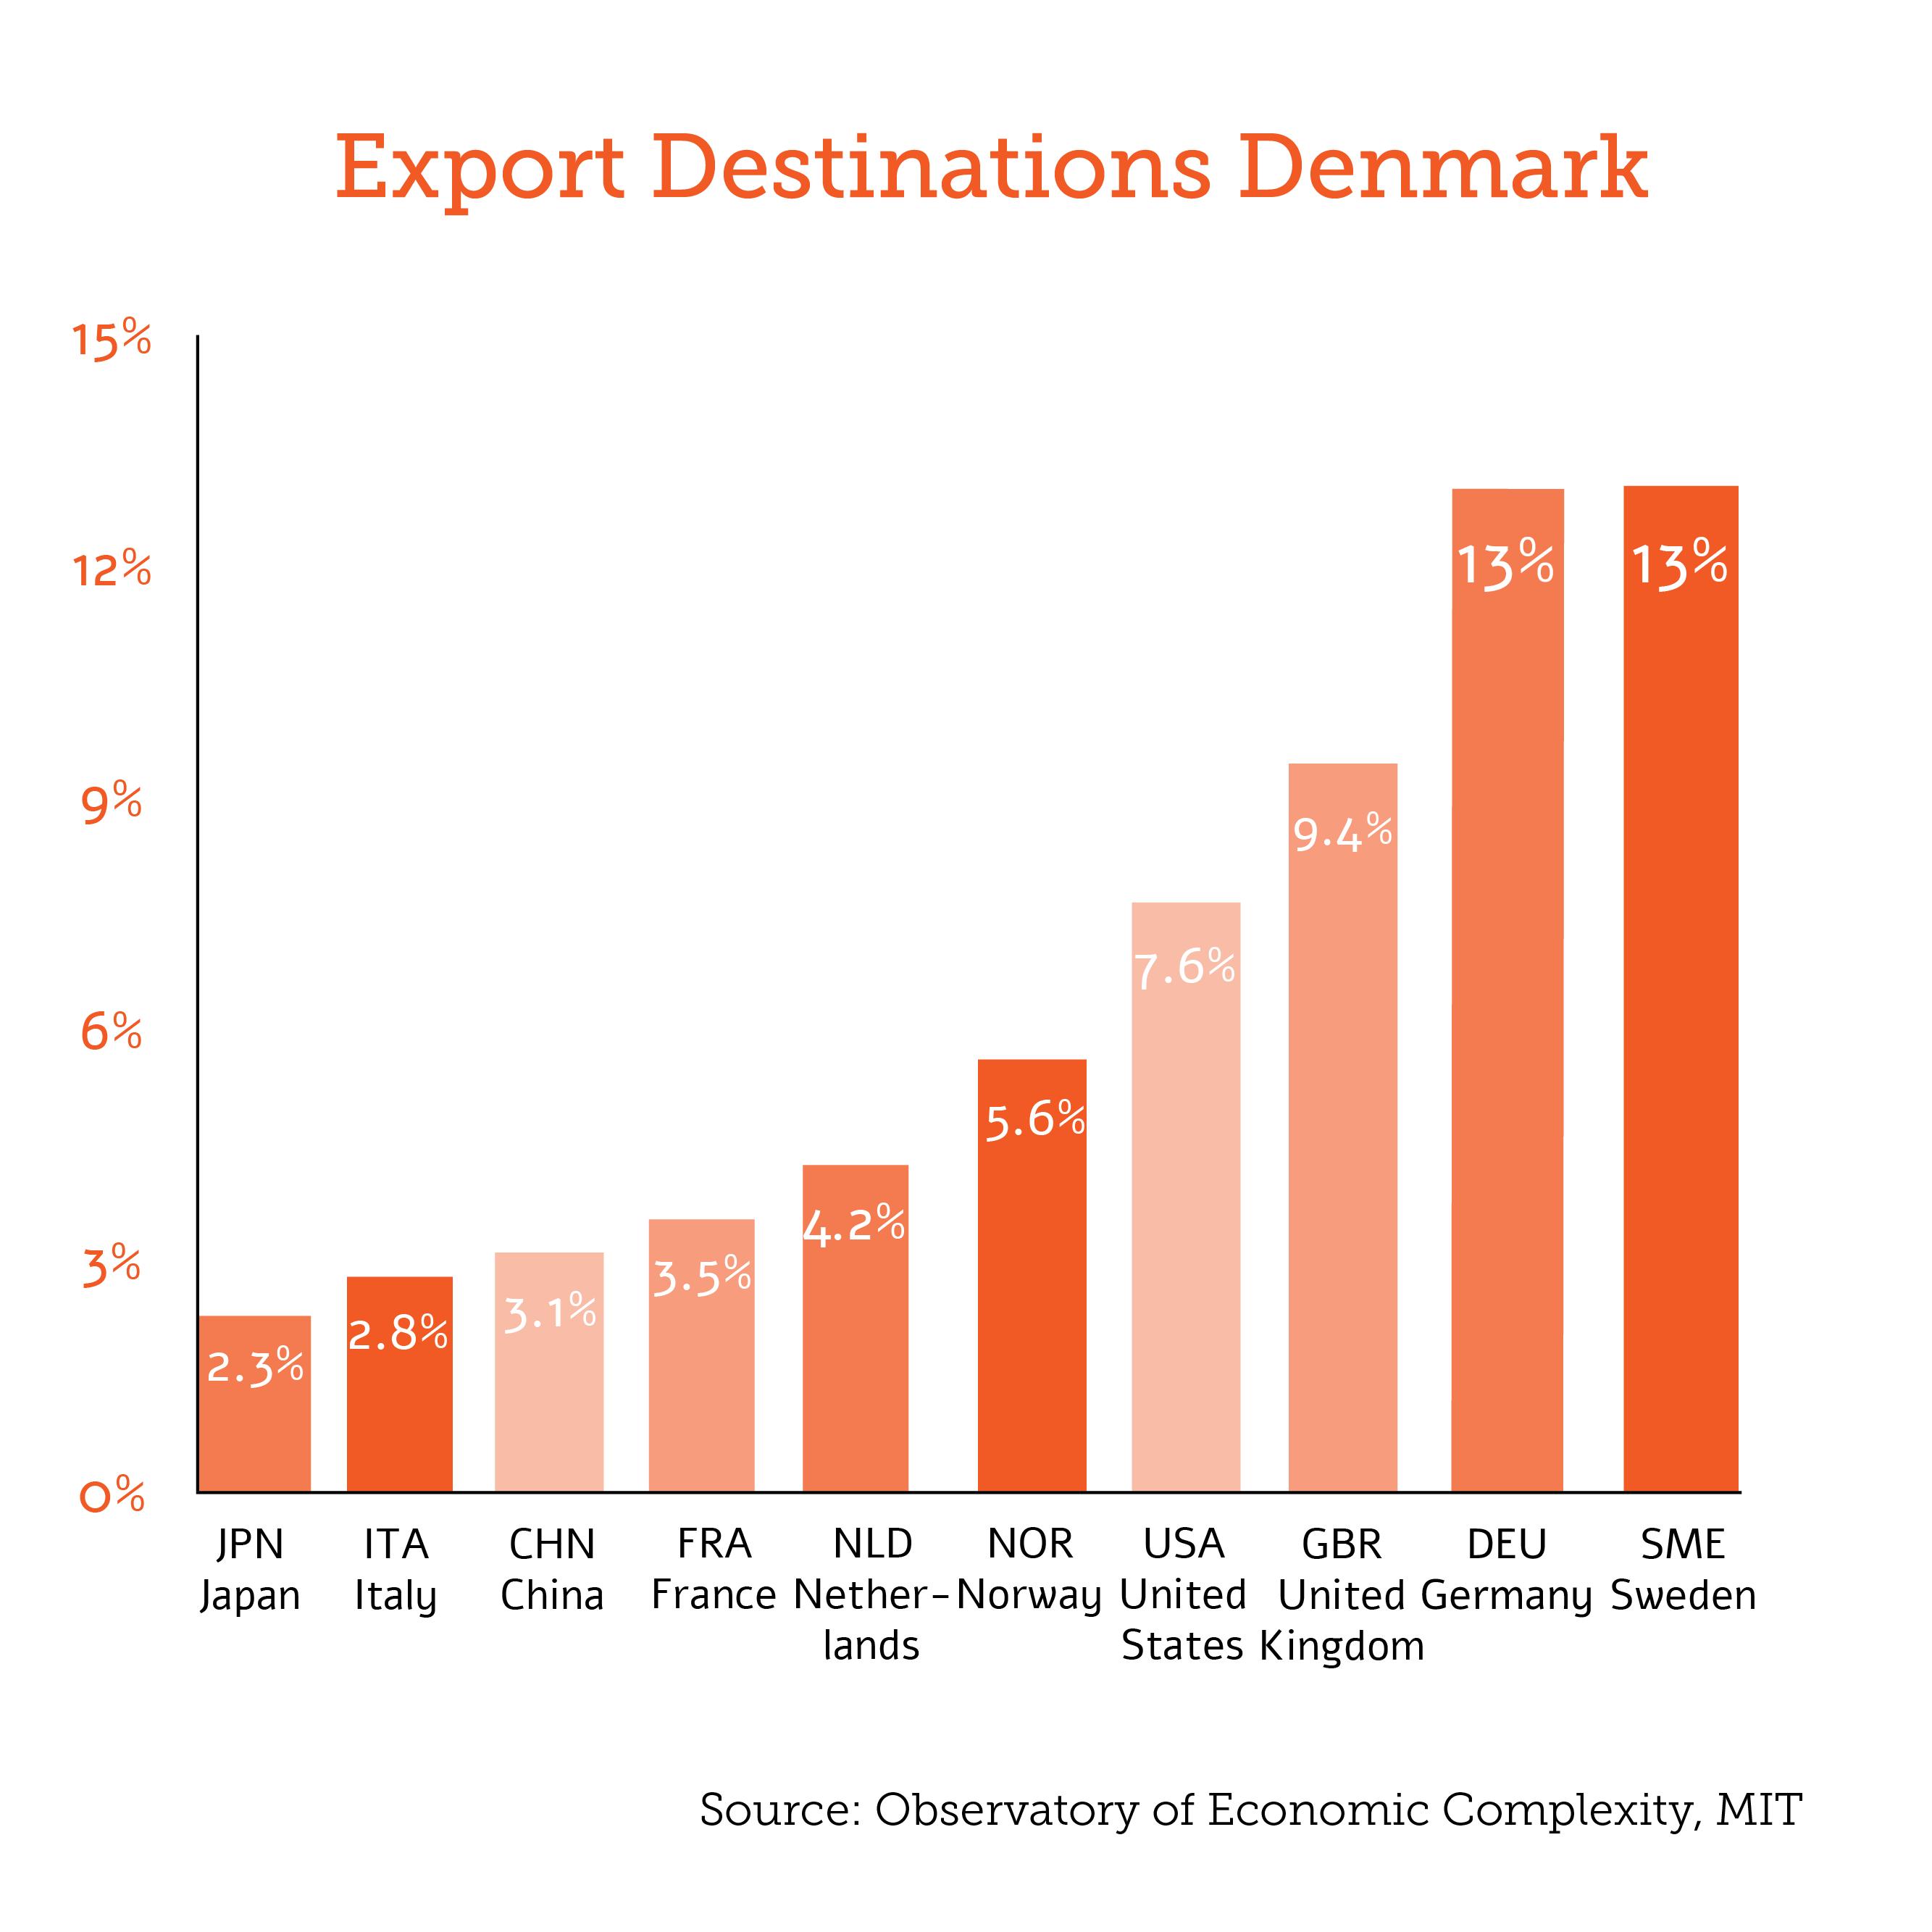 export destinations denmark